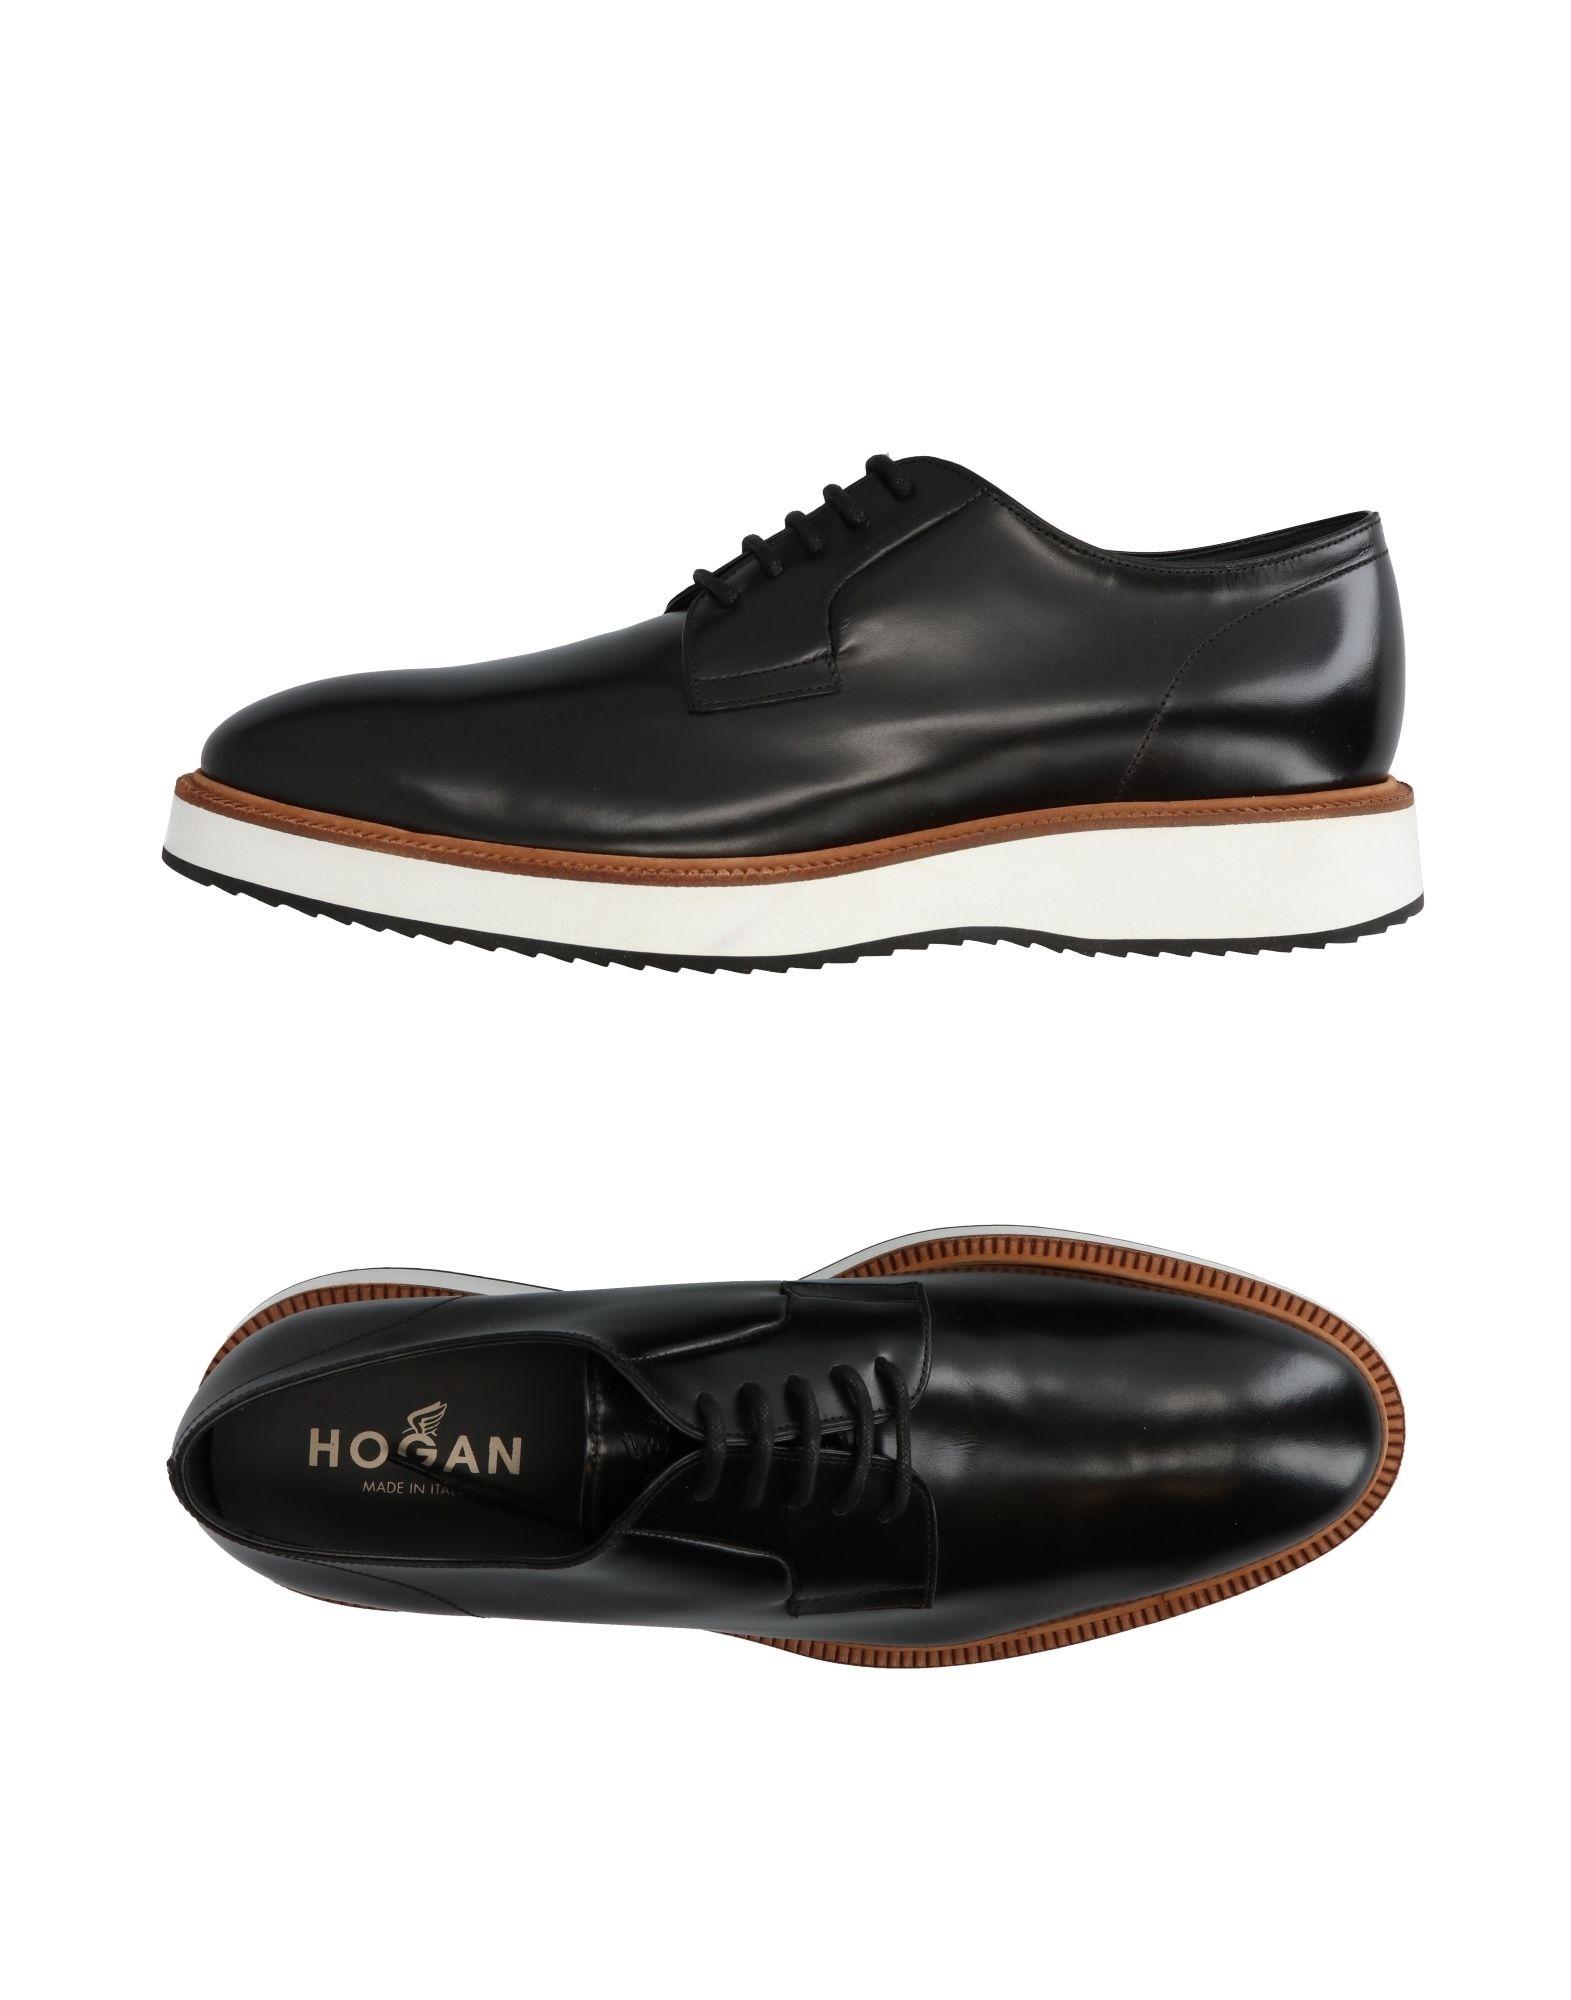 Moda Stringate Hogan Uomo - 11297442LR